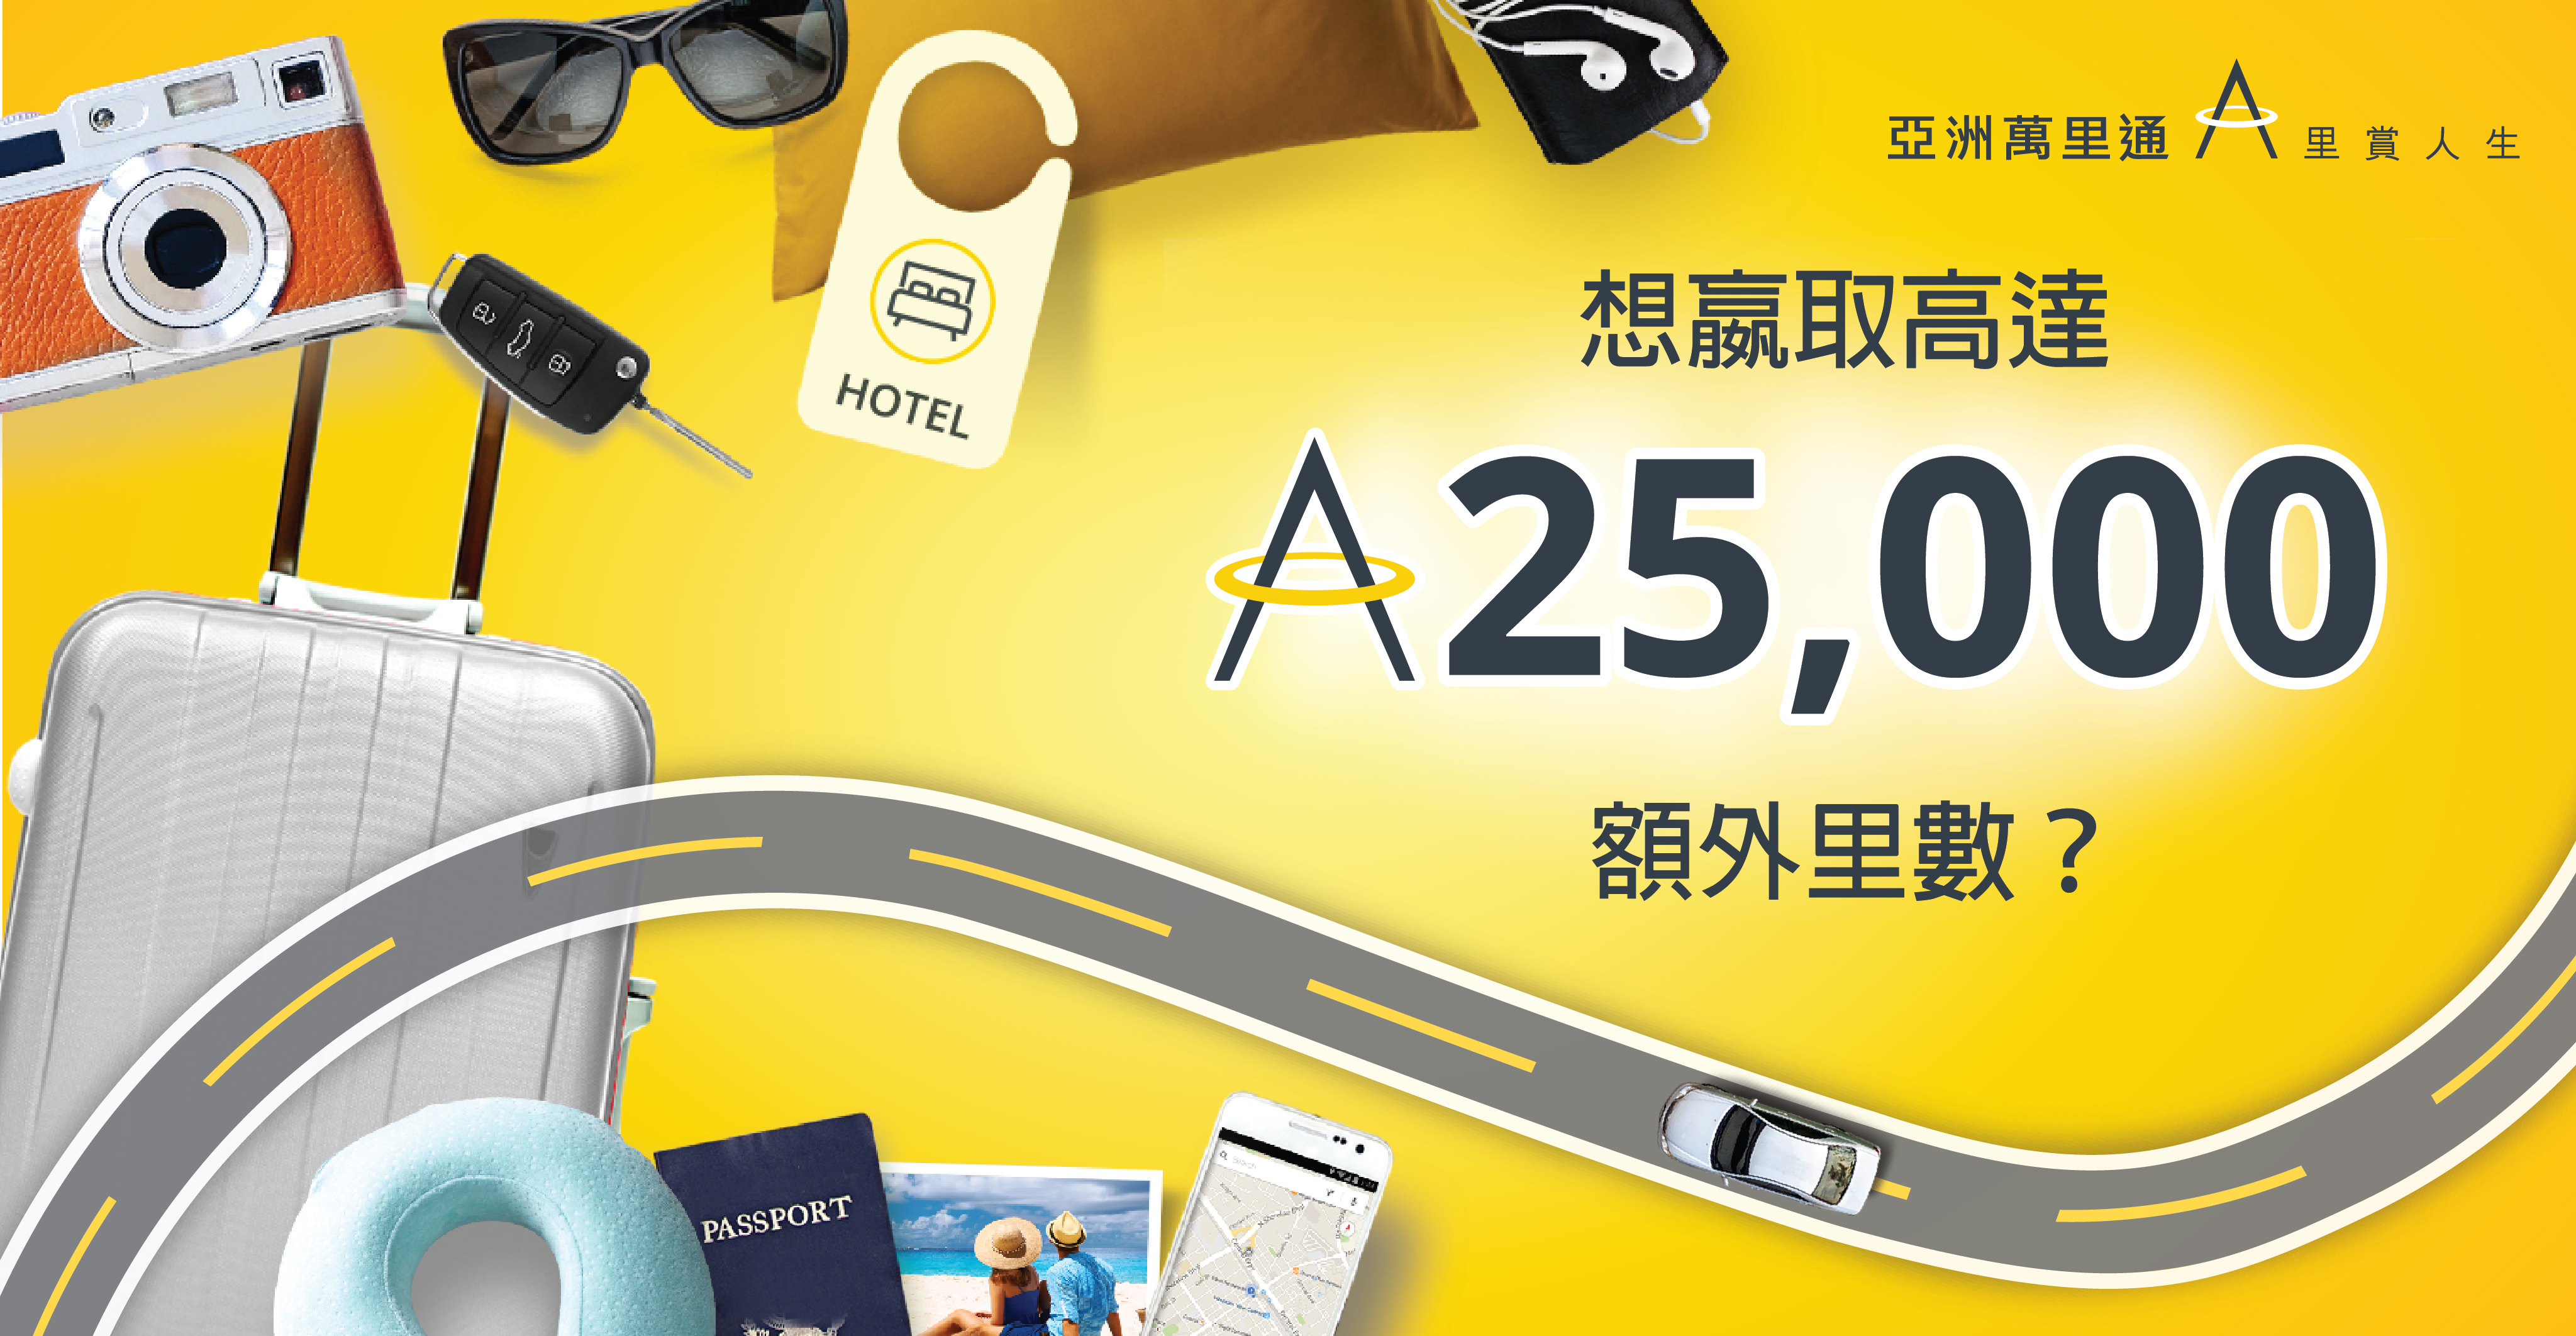 Asia Miles又有著數!惠顧酒店、汽車及運輸和旅遊消閒呢三個類別儲里數即可賺取5,000里!